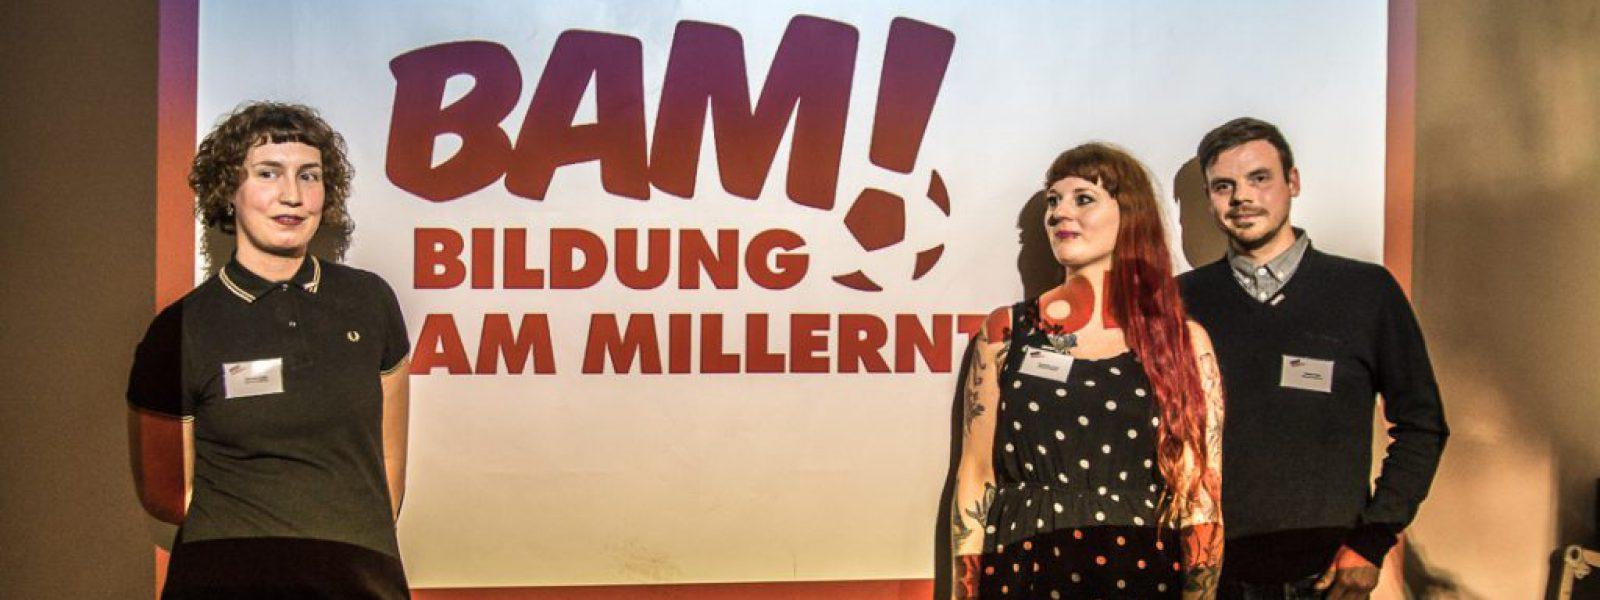 20190228_BAM_1910Museum_ArianeGramelspacher--67